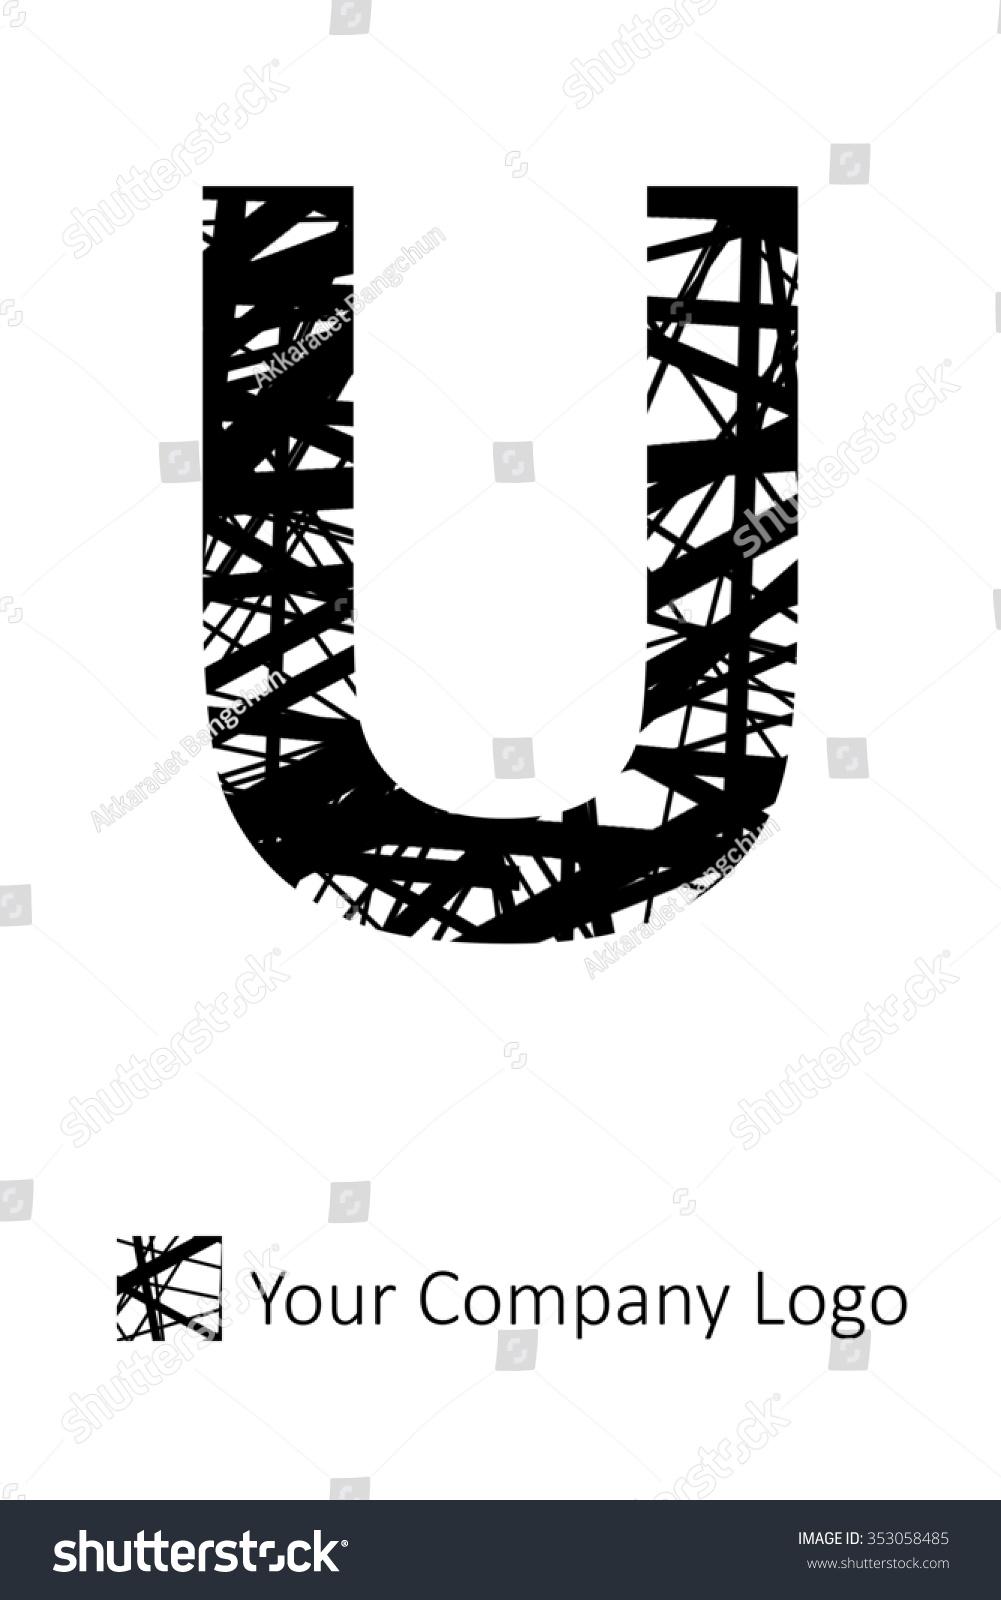 u alphabet design - photo #23